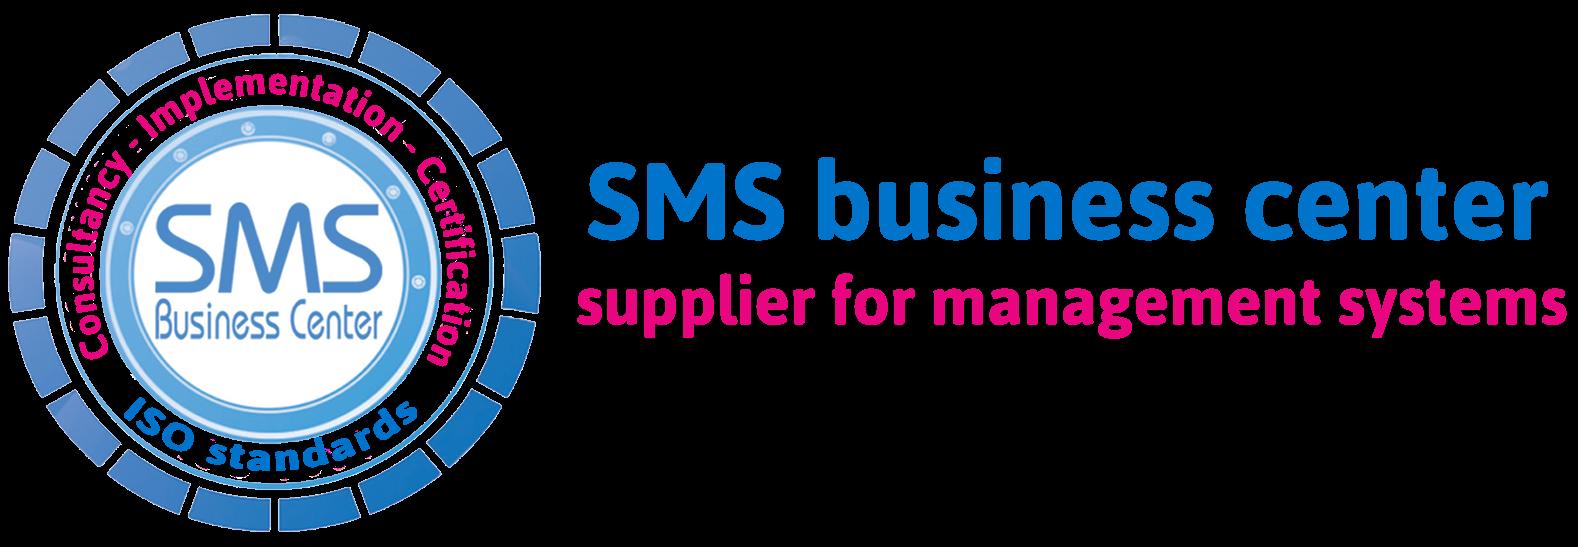 SMS Business Center